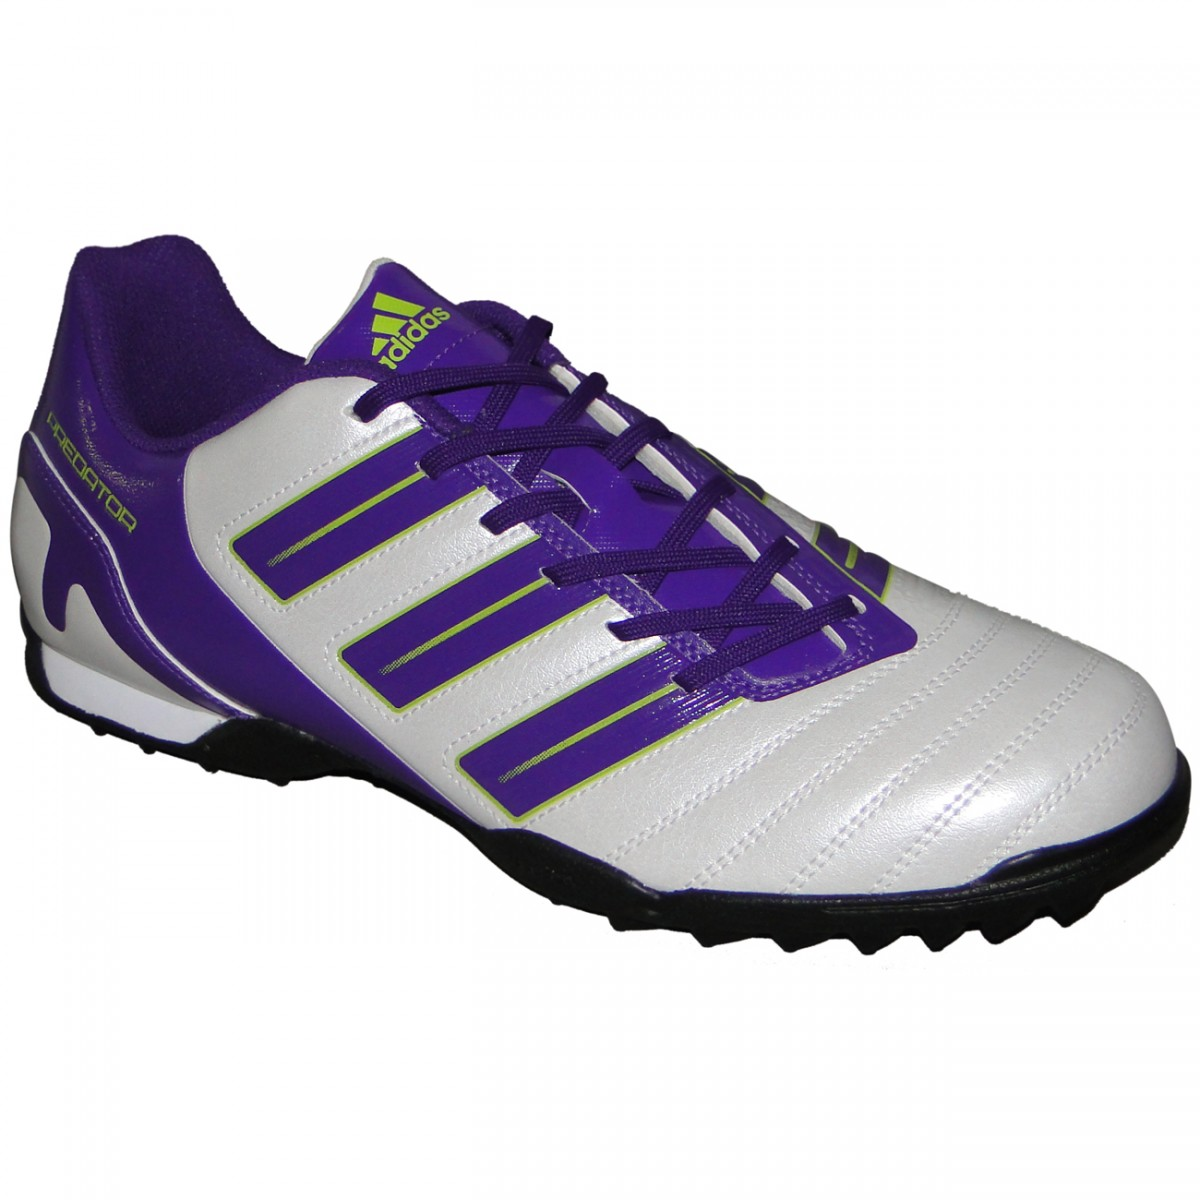 0a46be14f38ec Chuteira Society Adidas Predito 3049 - BRANCO ROXO - Chuteira Nike ...